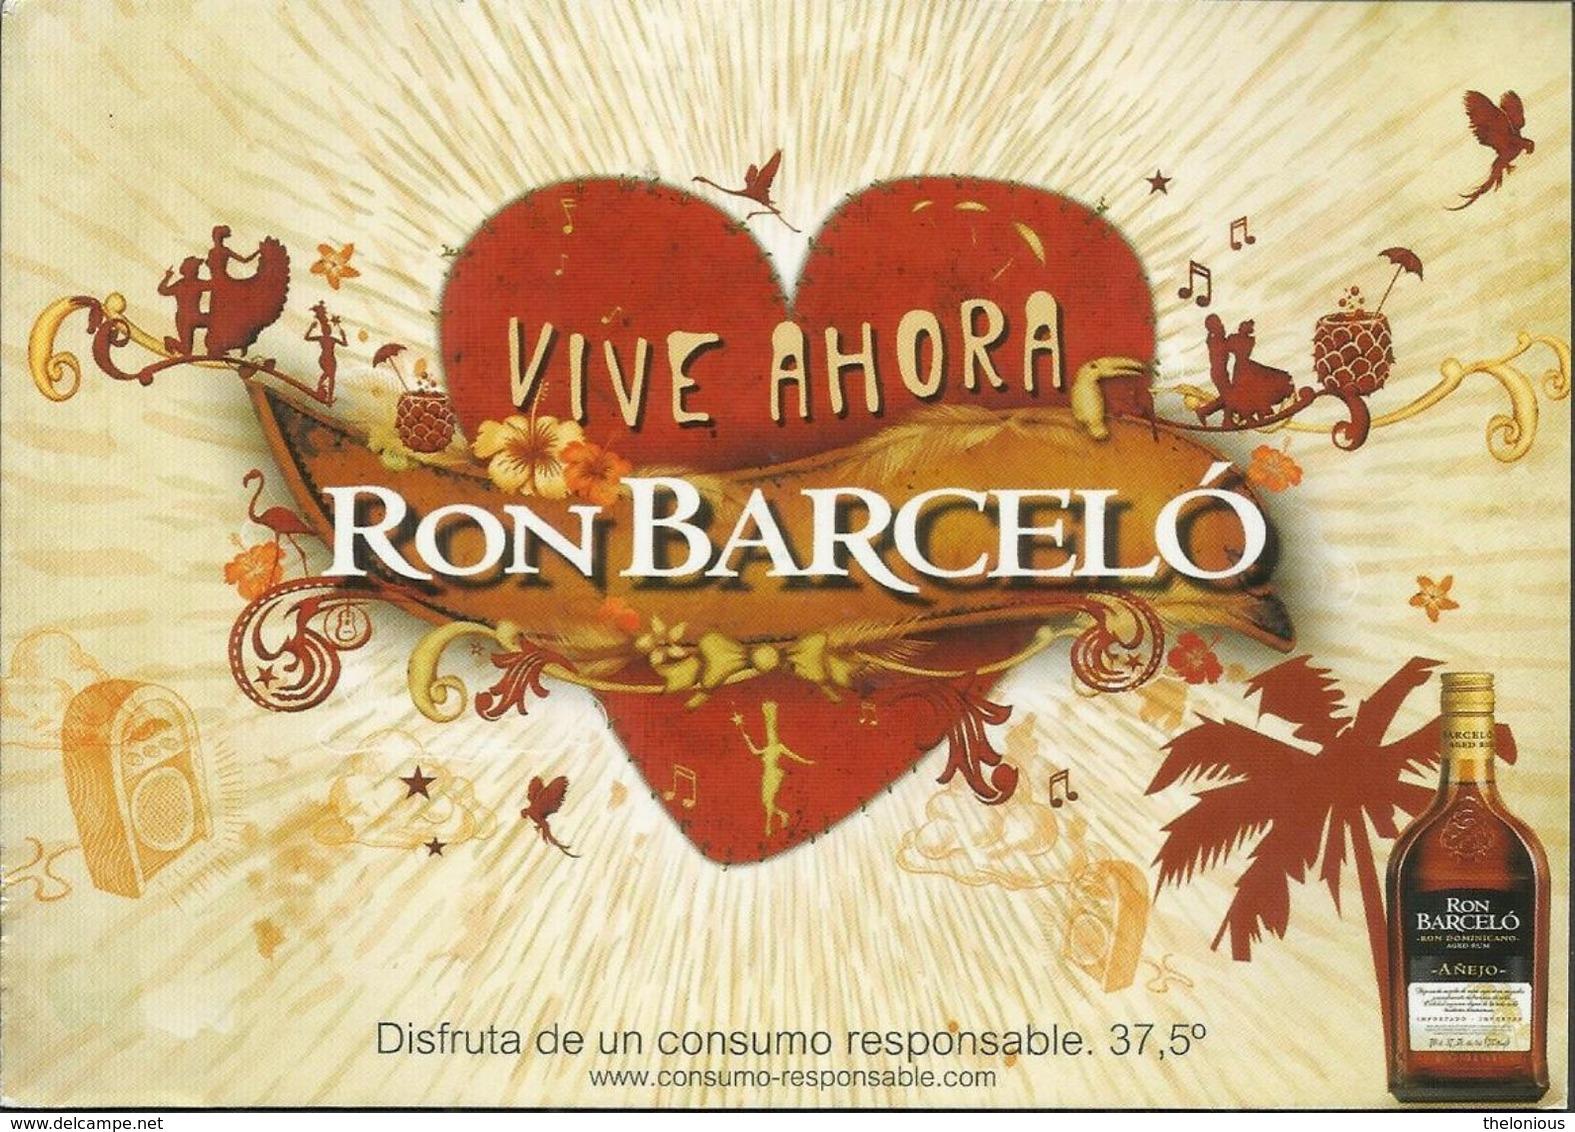 CARTOLINA - VIVE AHORA - RON BARCELO' RUN DOMENICANO - Commercio